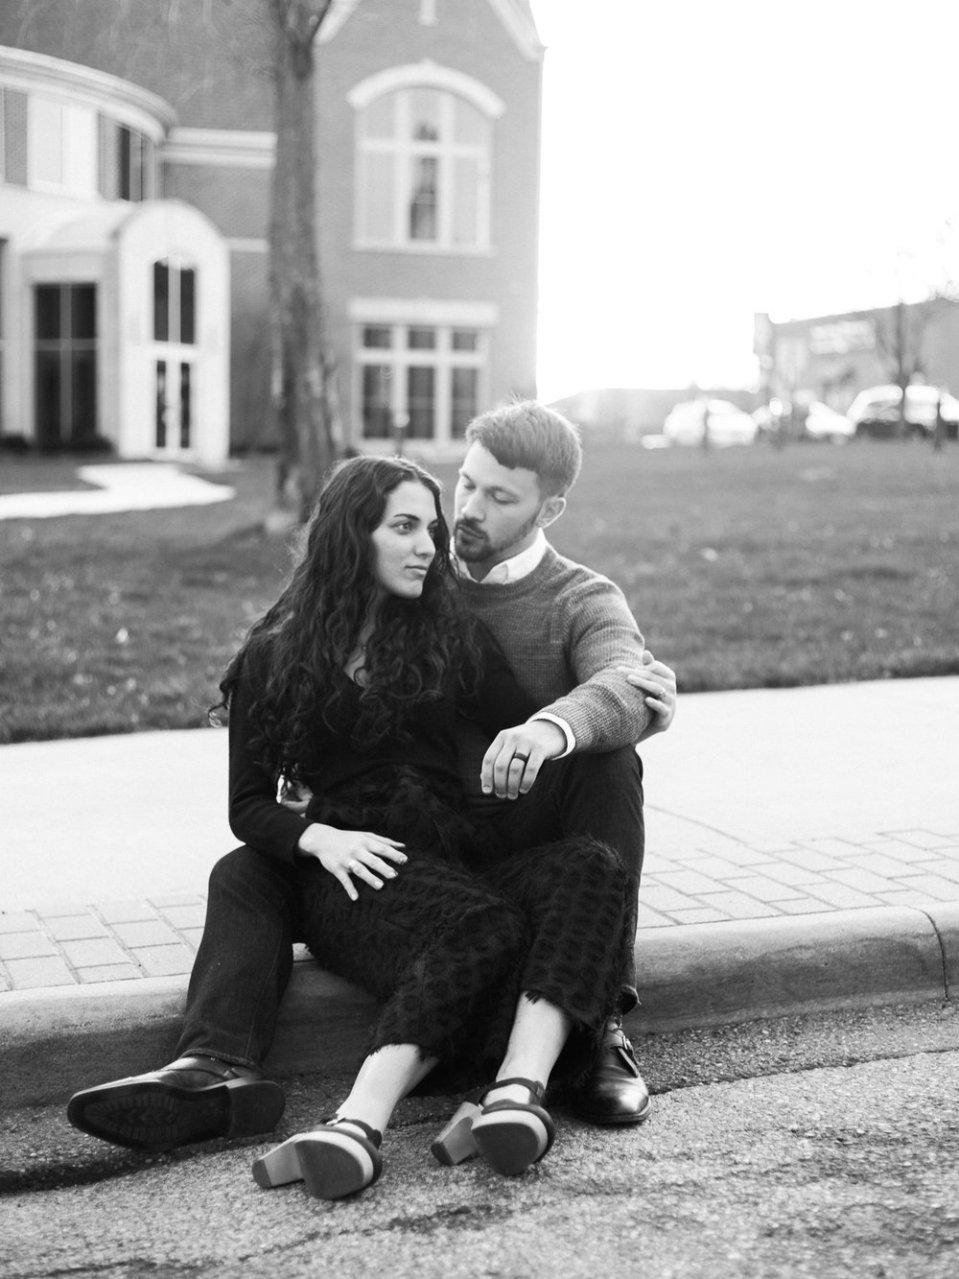 fashion-inspired-couples-photos-20.jpg